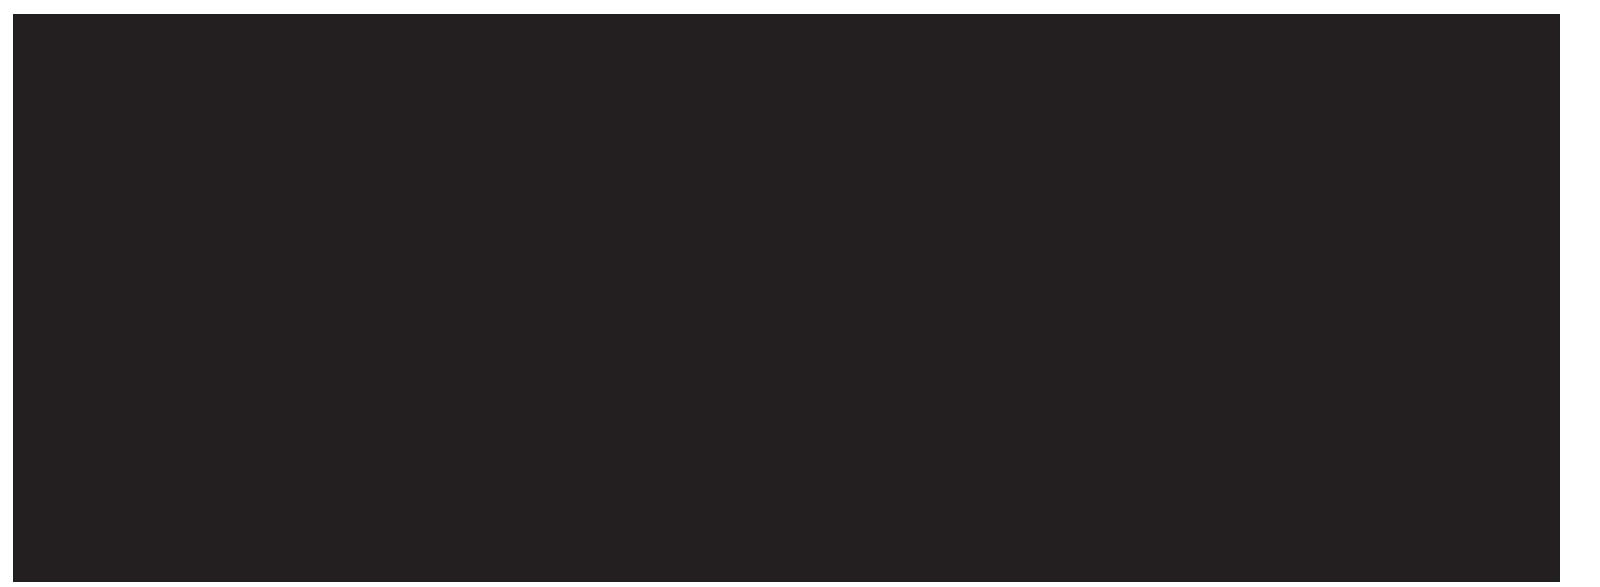 Comodistrict